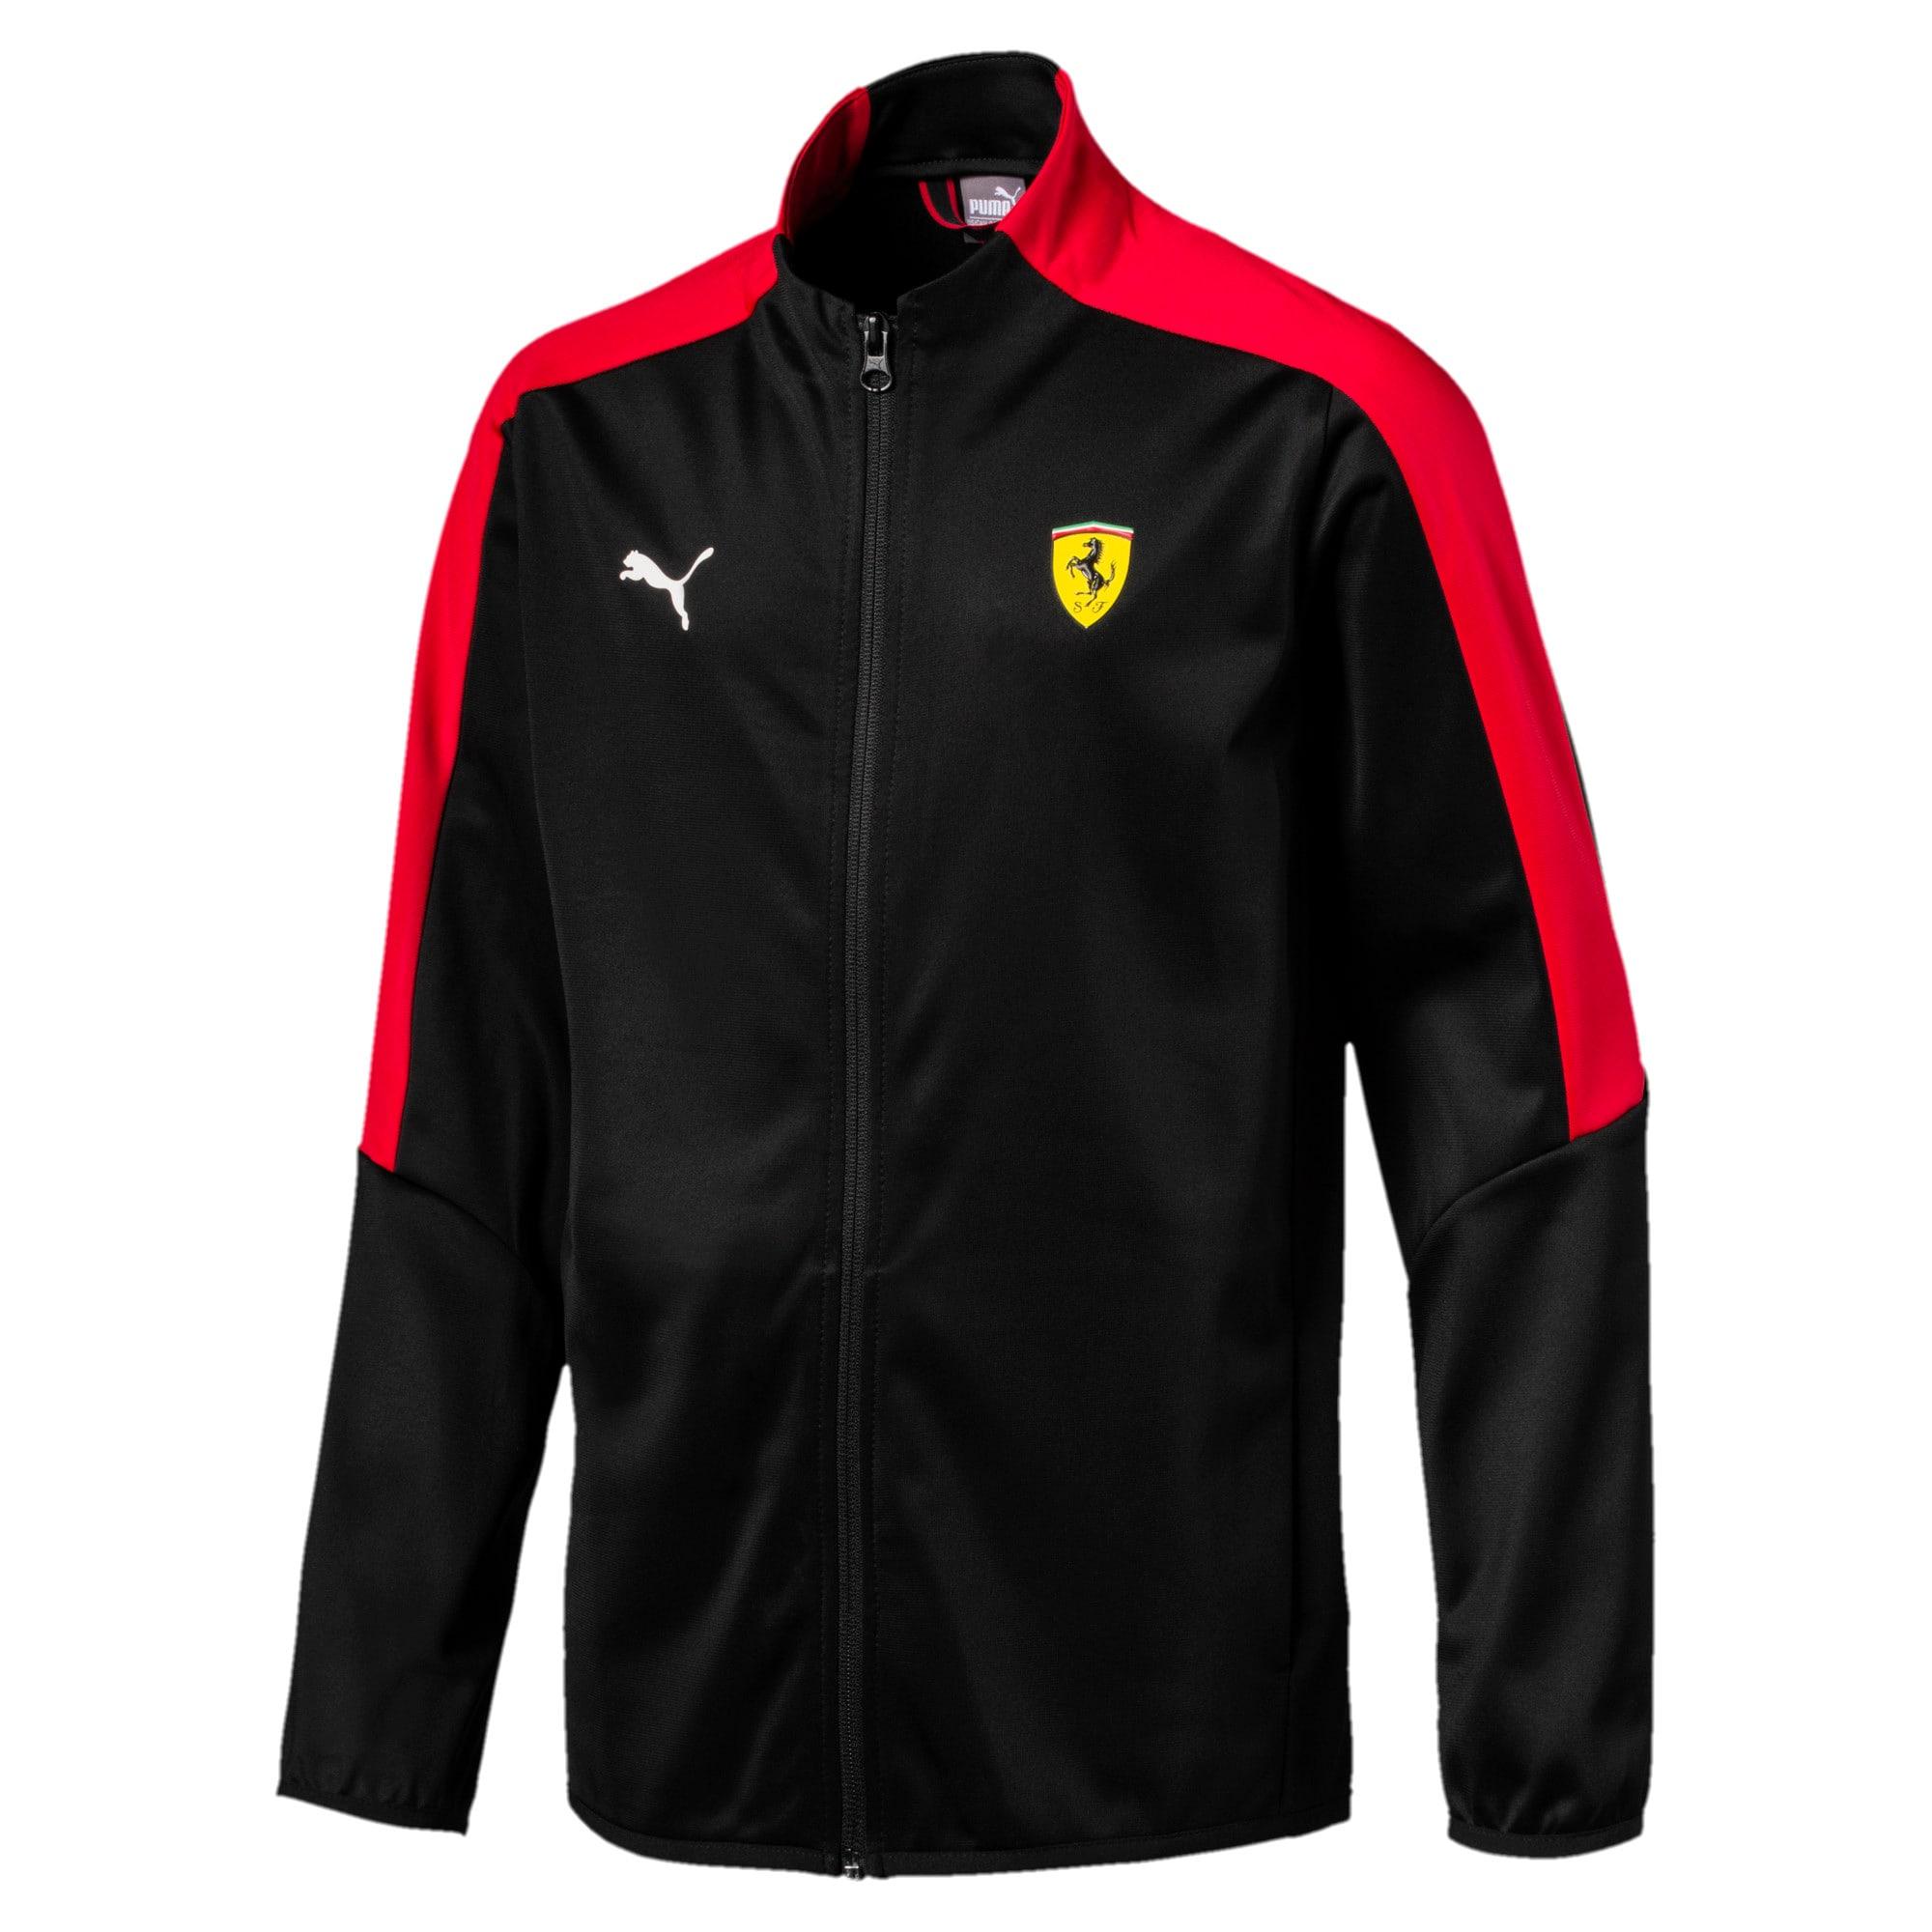 Thumbnail 1 of Scuderia Ferrari Boys' T7 Track Jacket JR, Puma Black, medium